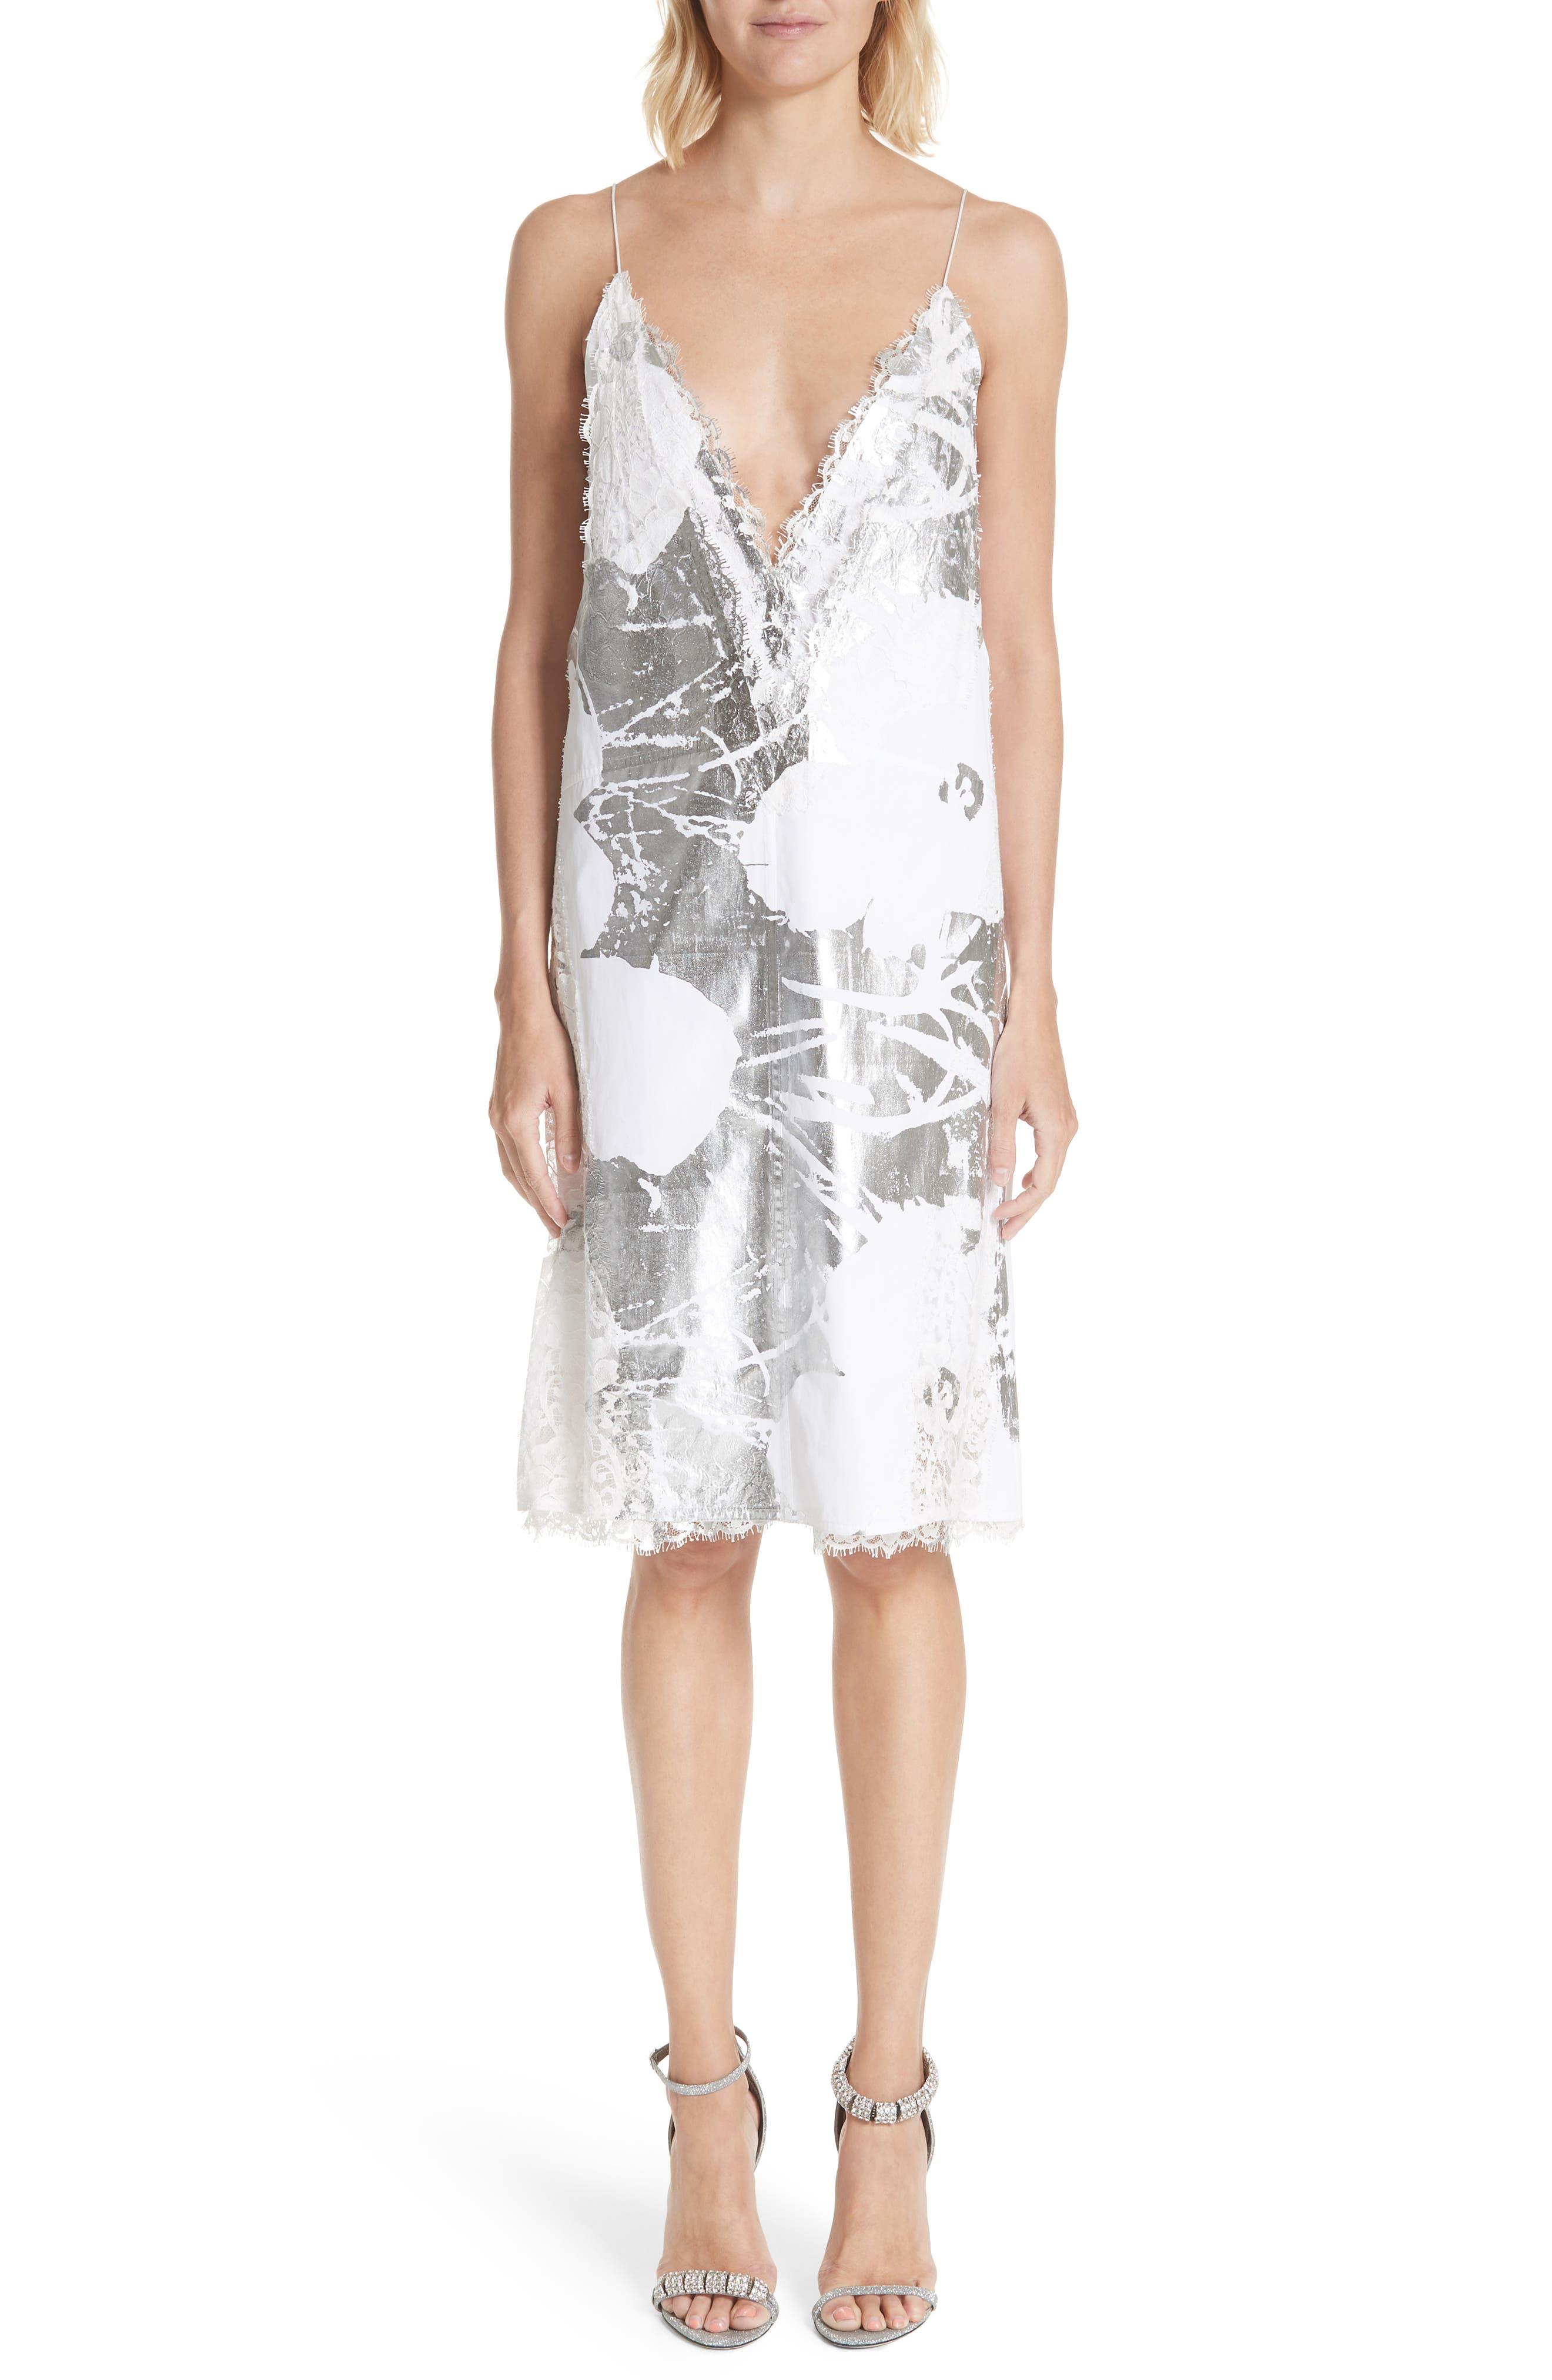 X Andy Warhol Foundation Foil Flowers Slipdress by Calvin Klein 205 W39 Nyc